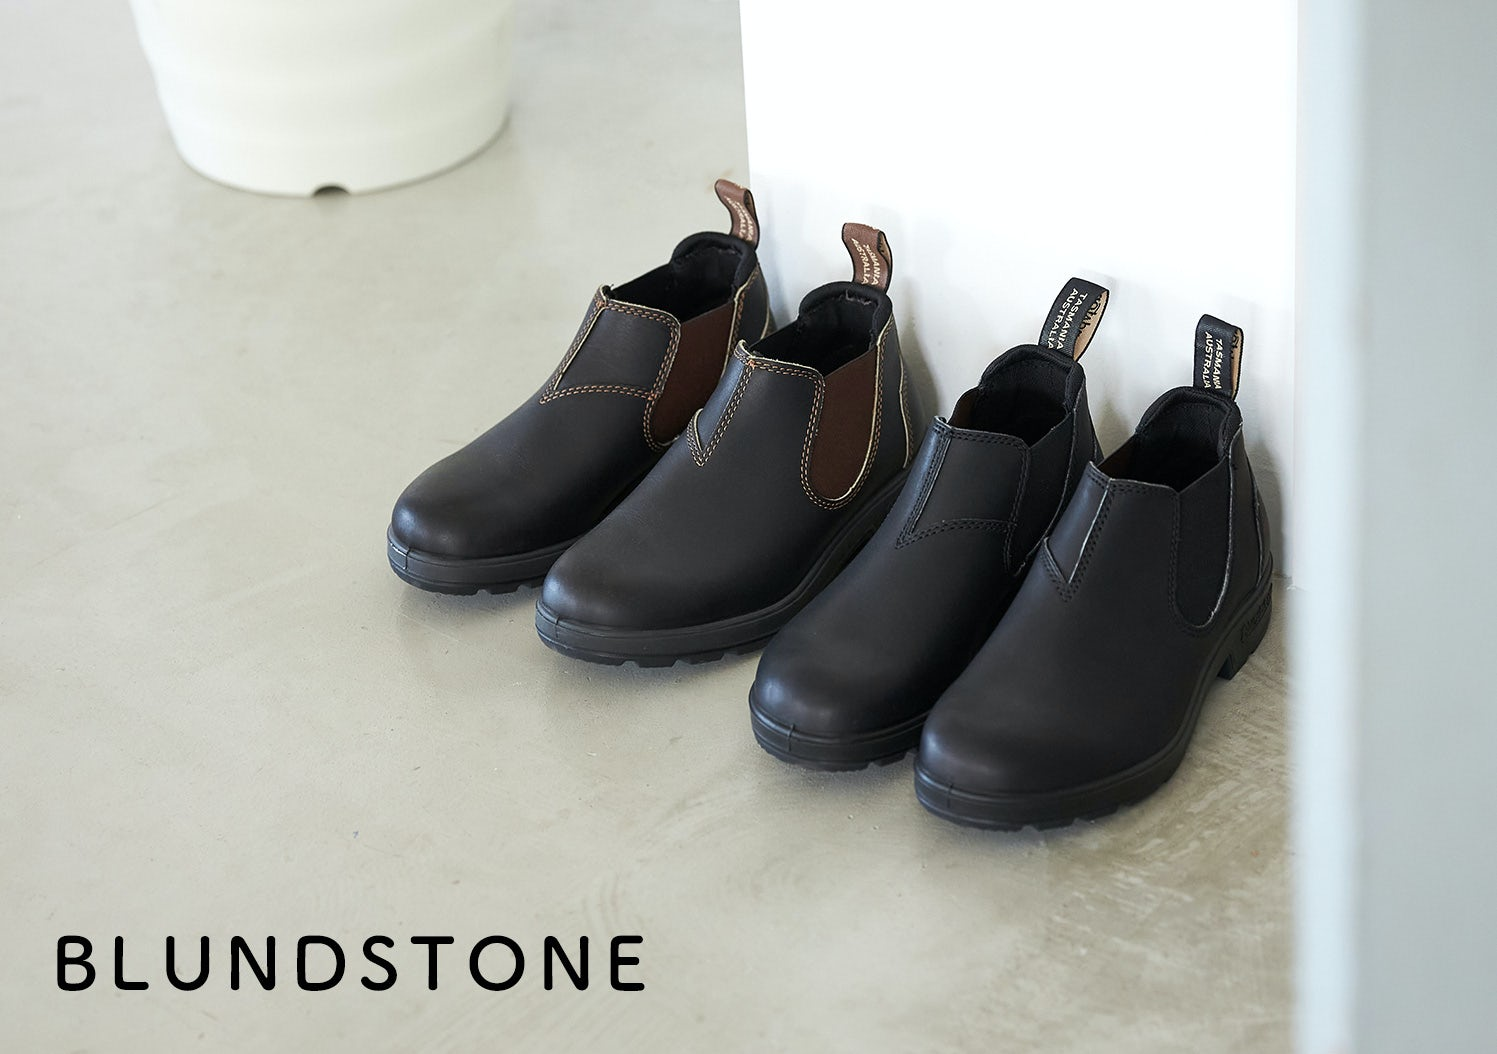 BLUNDSTONE / ブランドストーン / ローカットブーツの画像